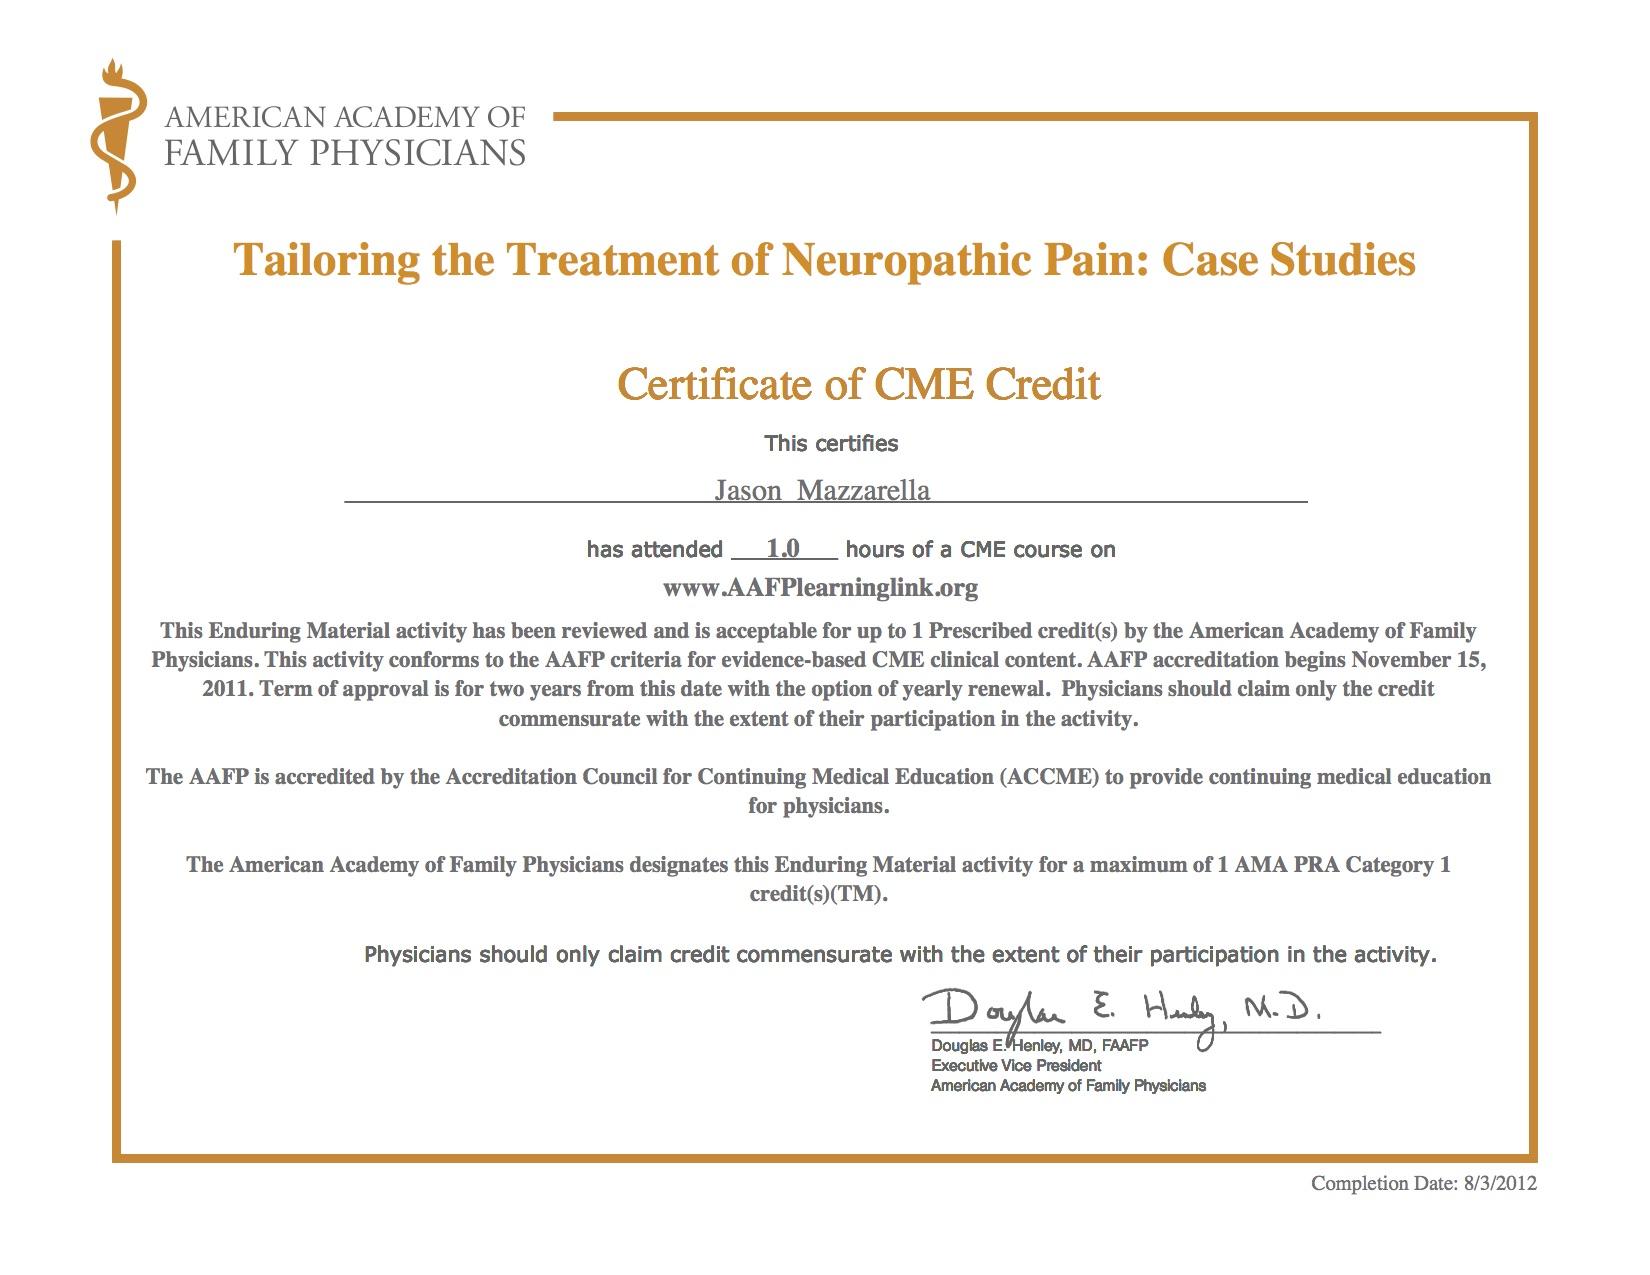 AAFP Cert Neuropathic 7